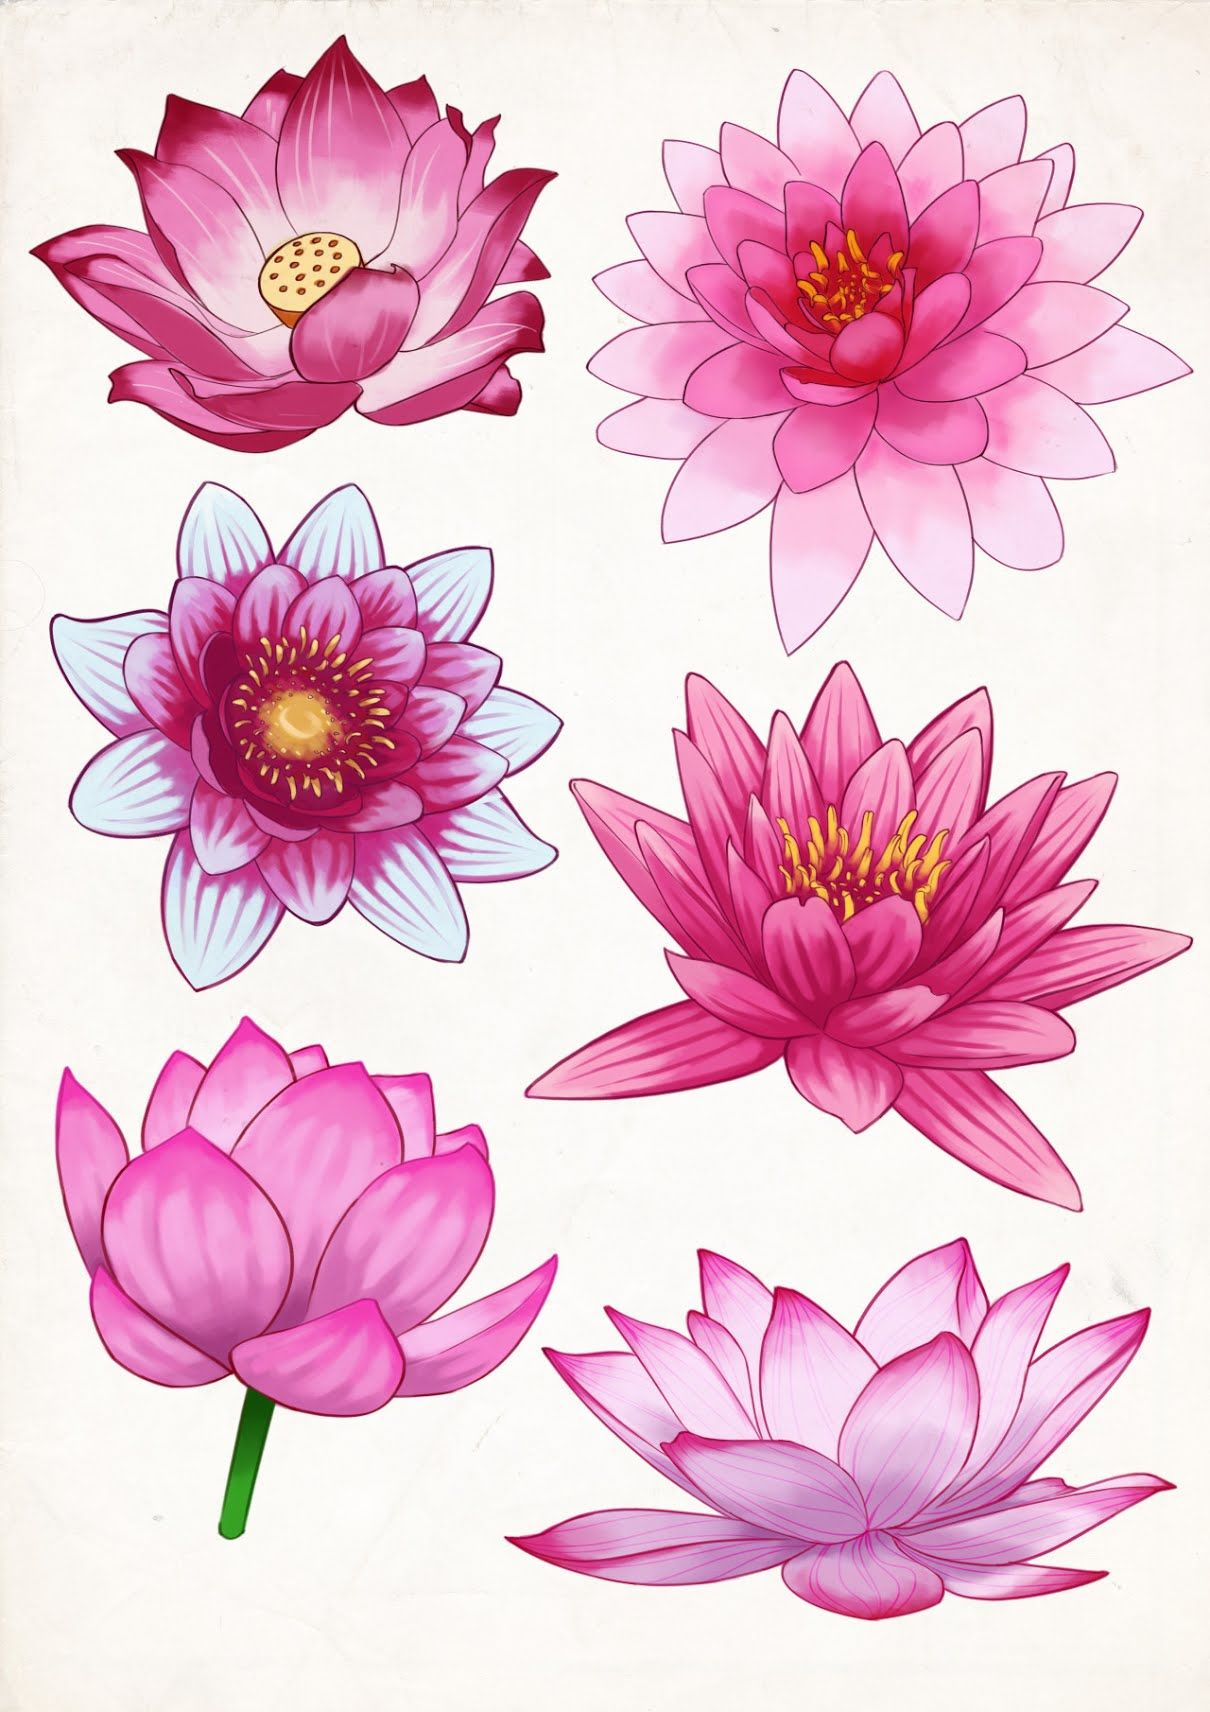 Felinetrickster Artwork Some Pink Lotus Flower Studies Abstract